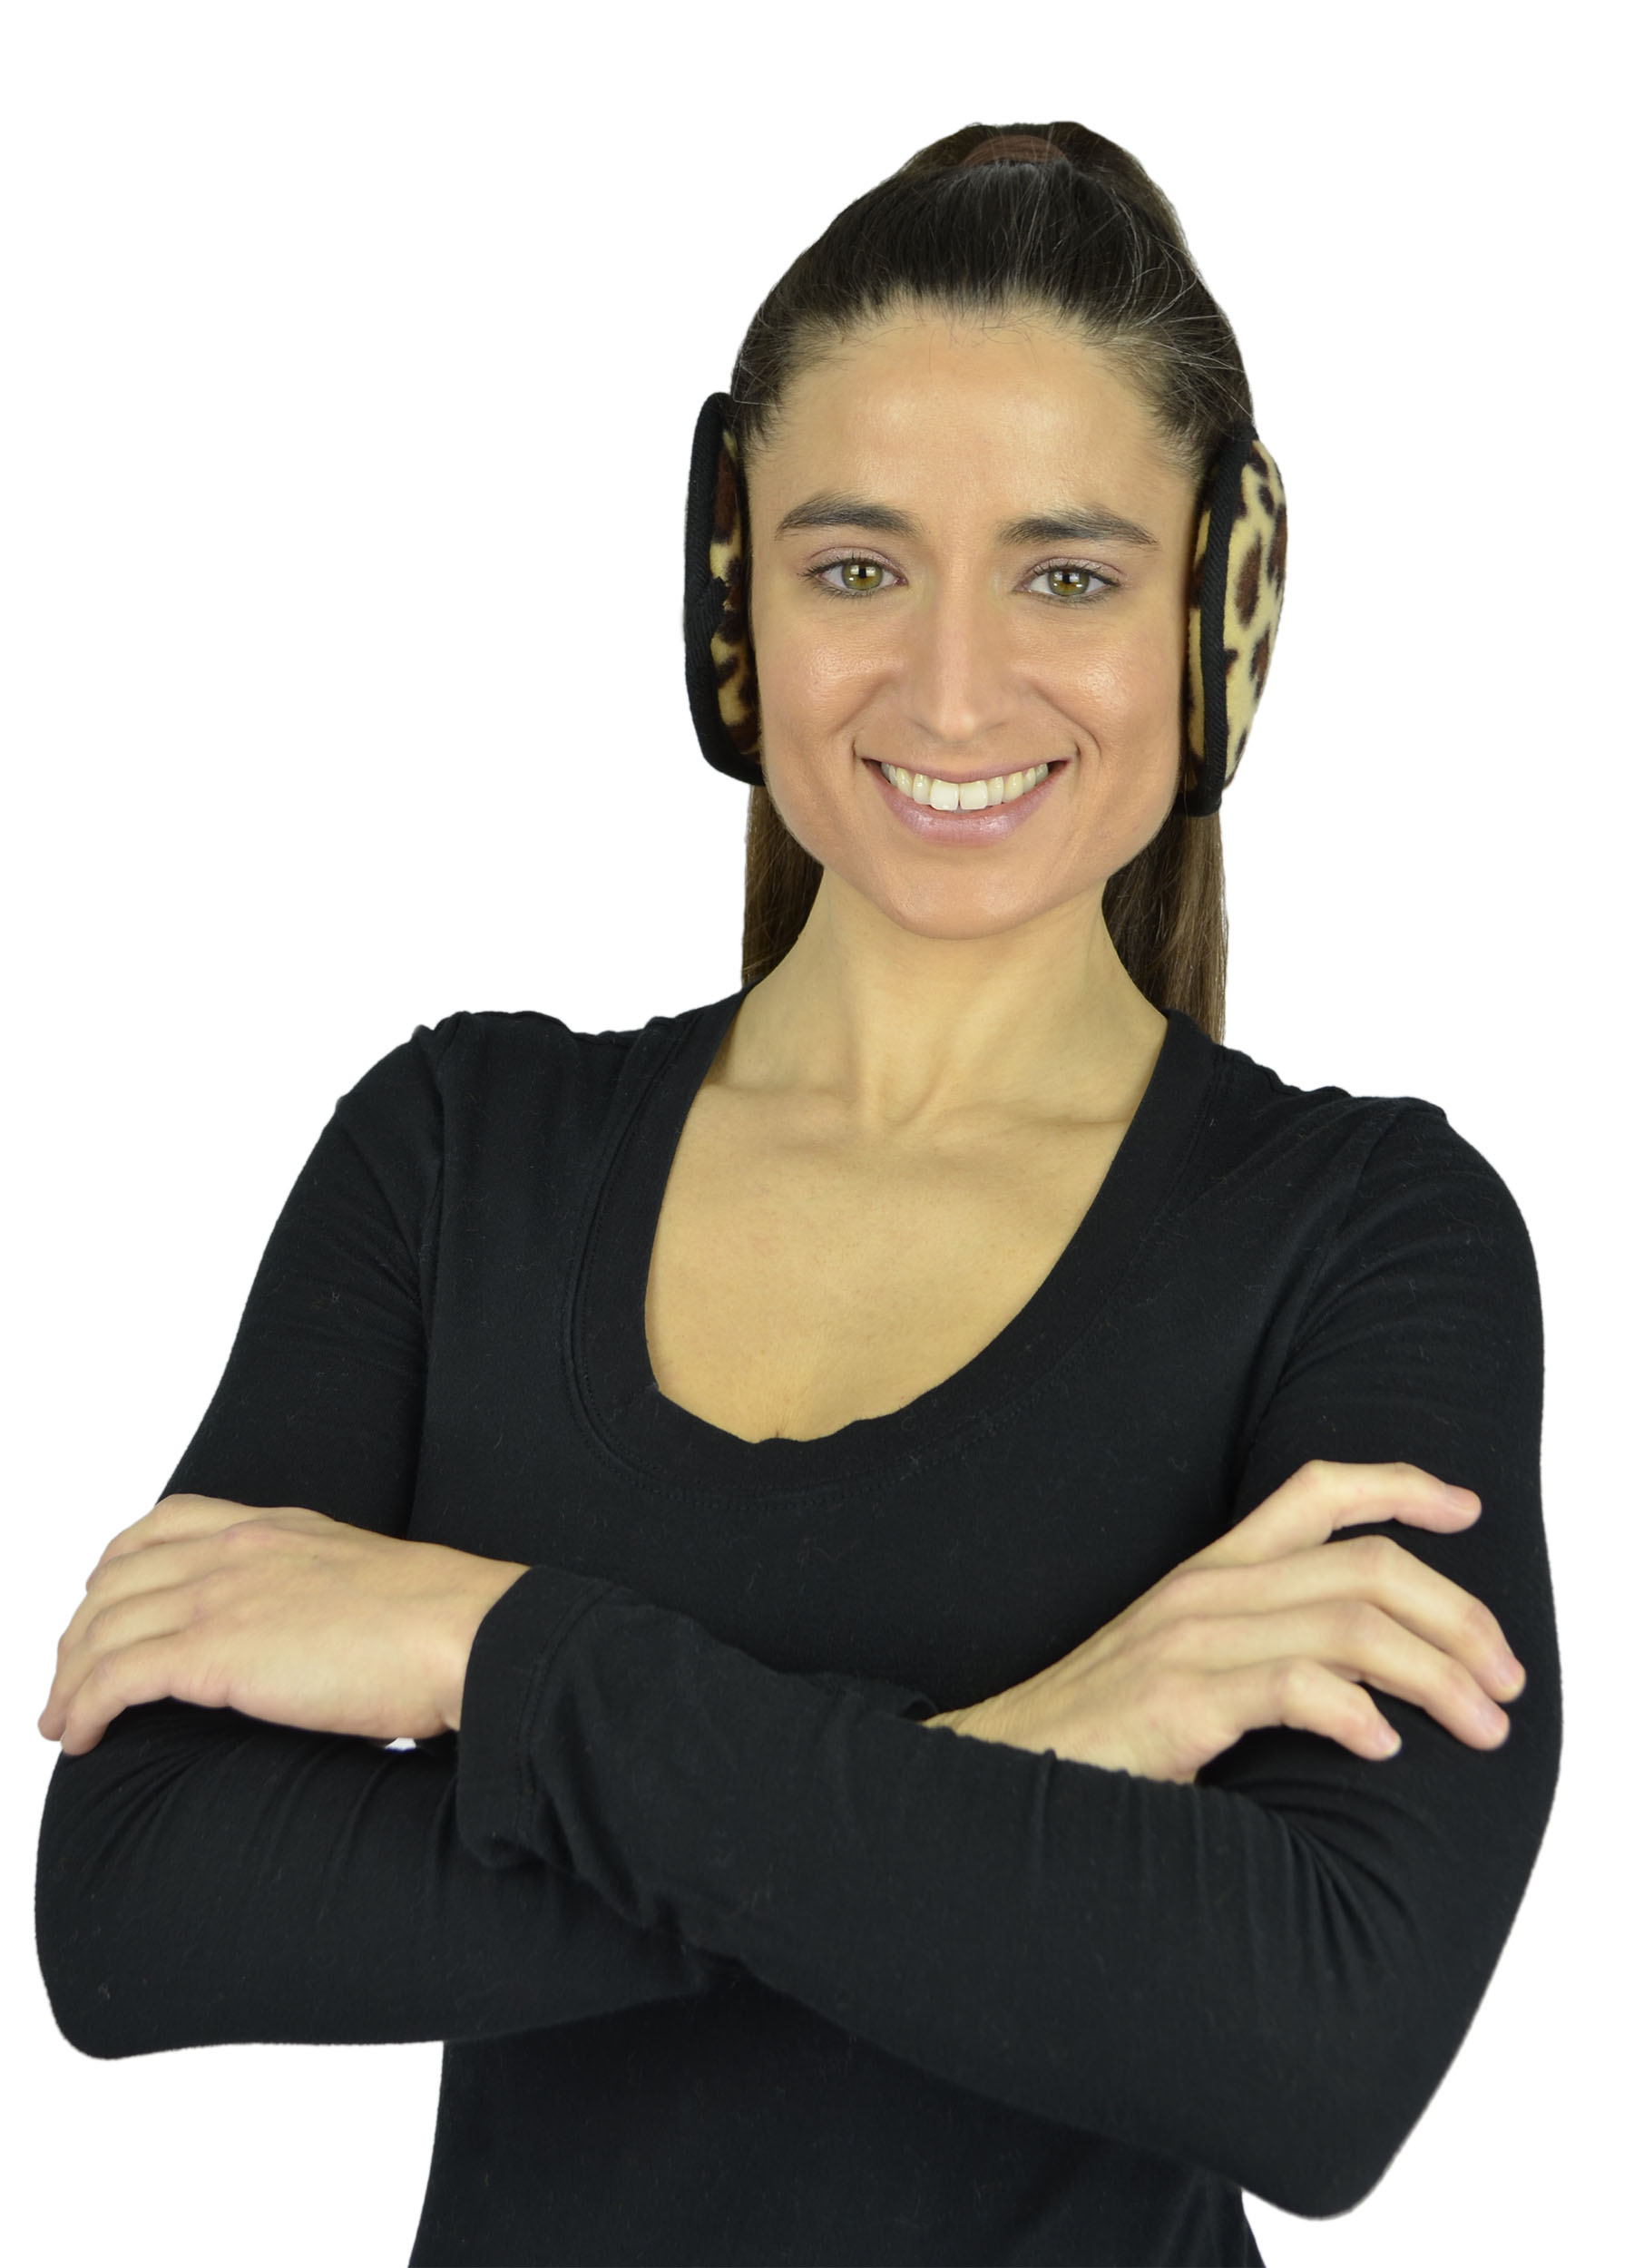 Unisex Ear Warmers - Foldable Fleece Behind the Head Polar Fleece EarMuffs - Multi